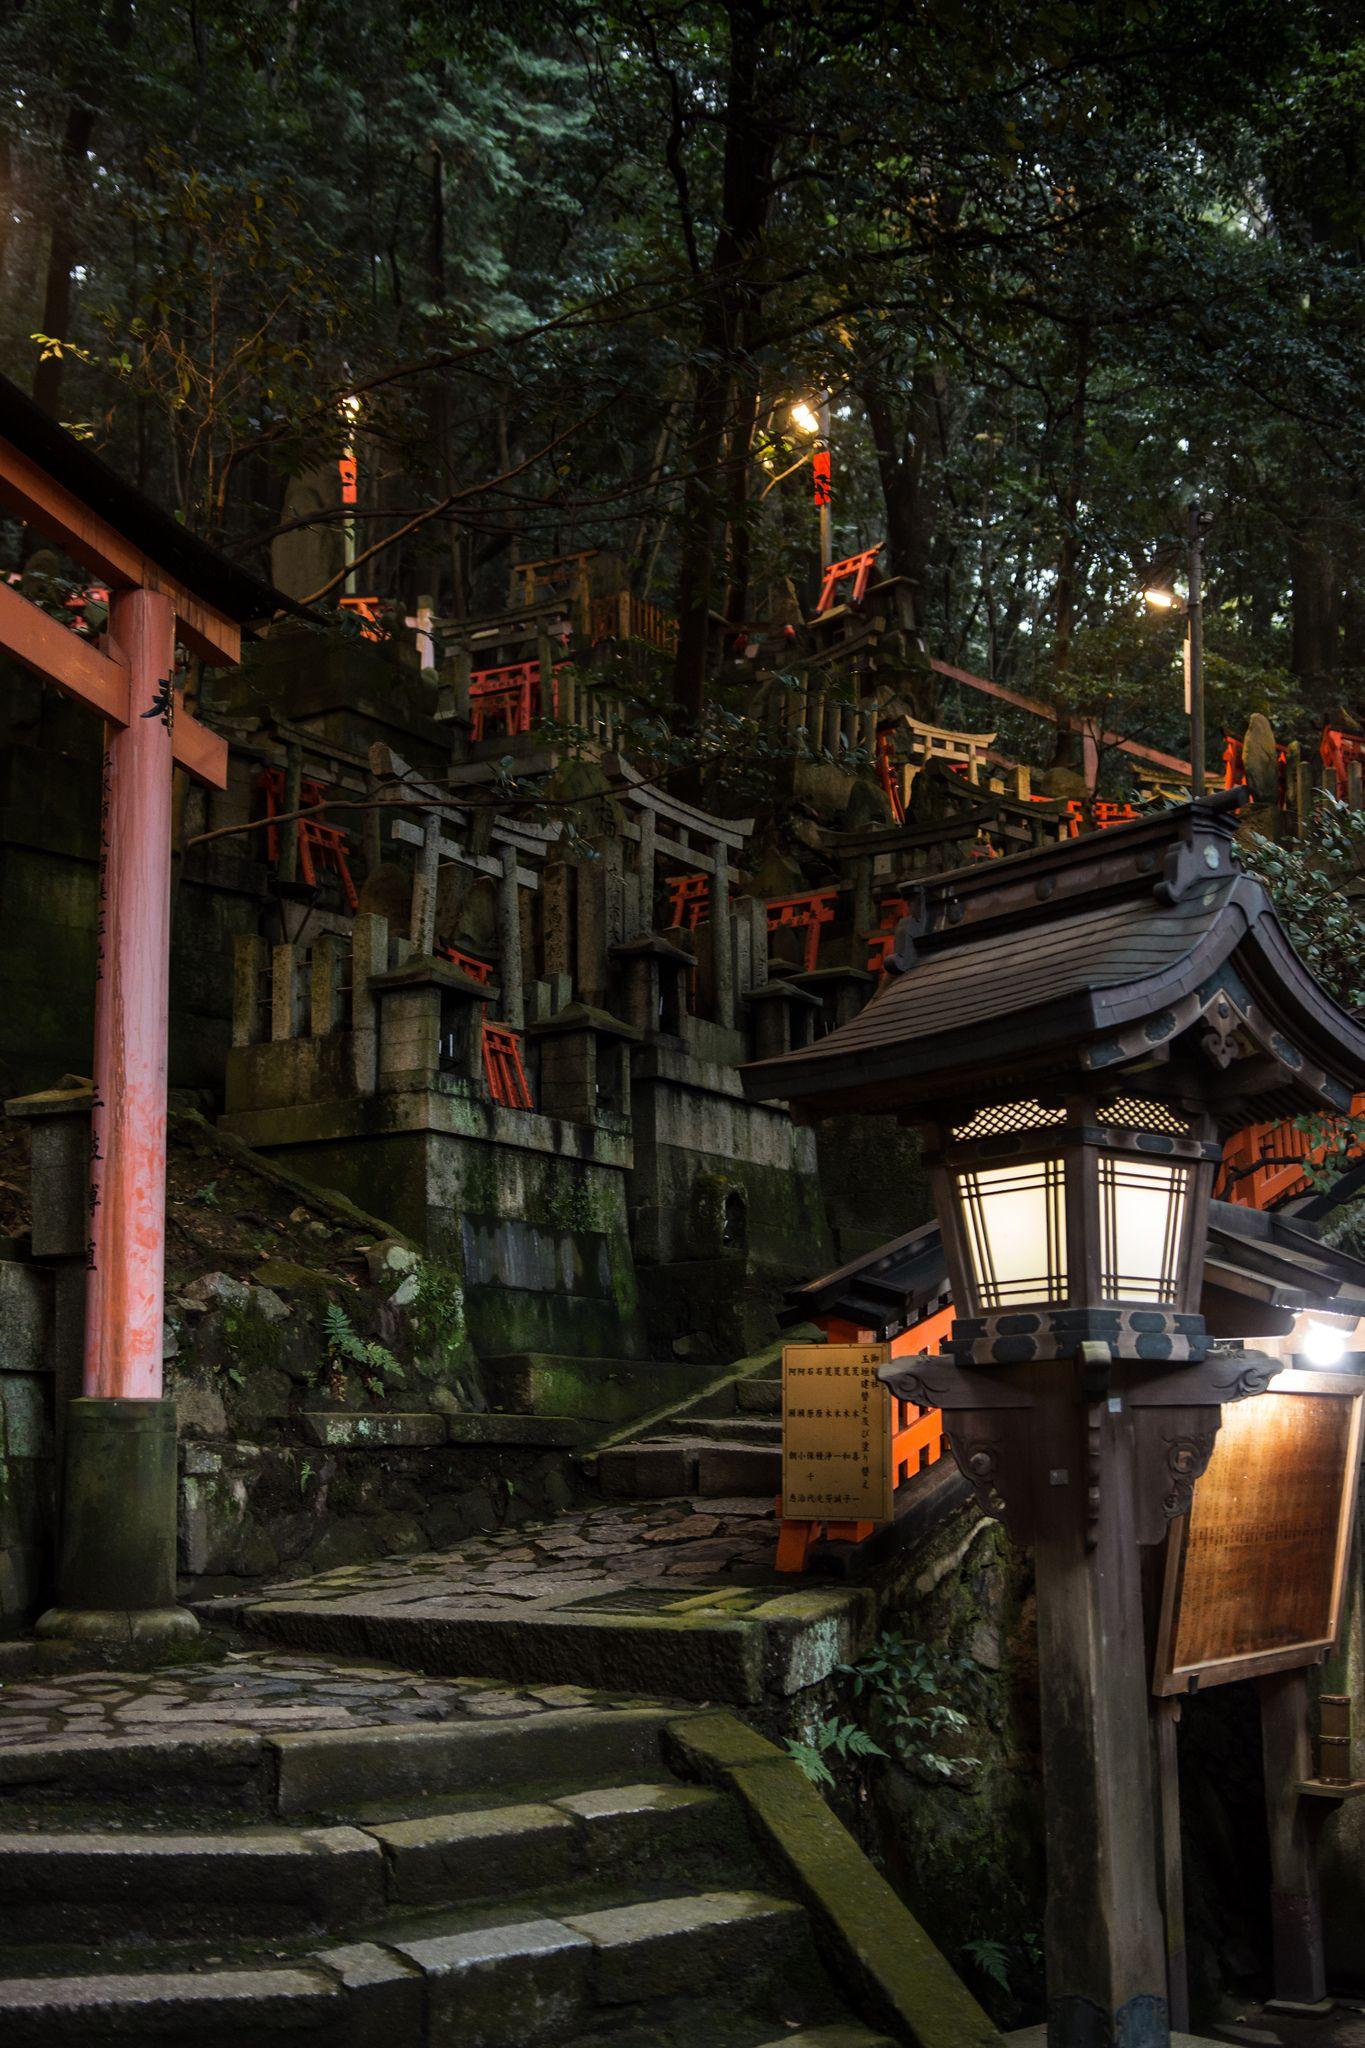 Mitsurugisha In Fushimi Inari Shrine Kyoto Japan And Homeland - This amazing image is being called the most beautiful photo of kyoto ever